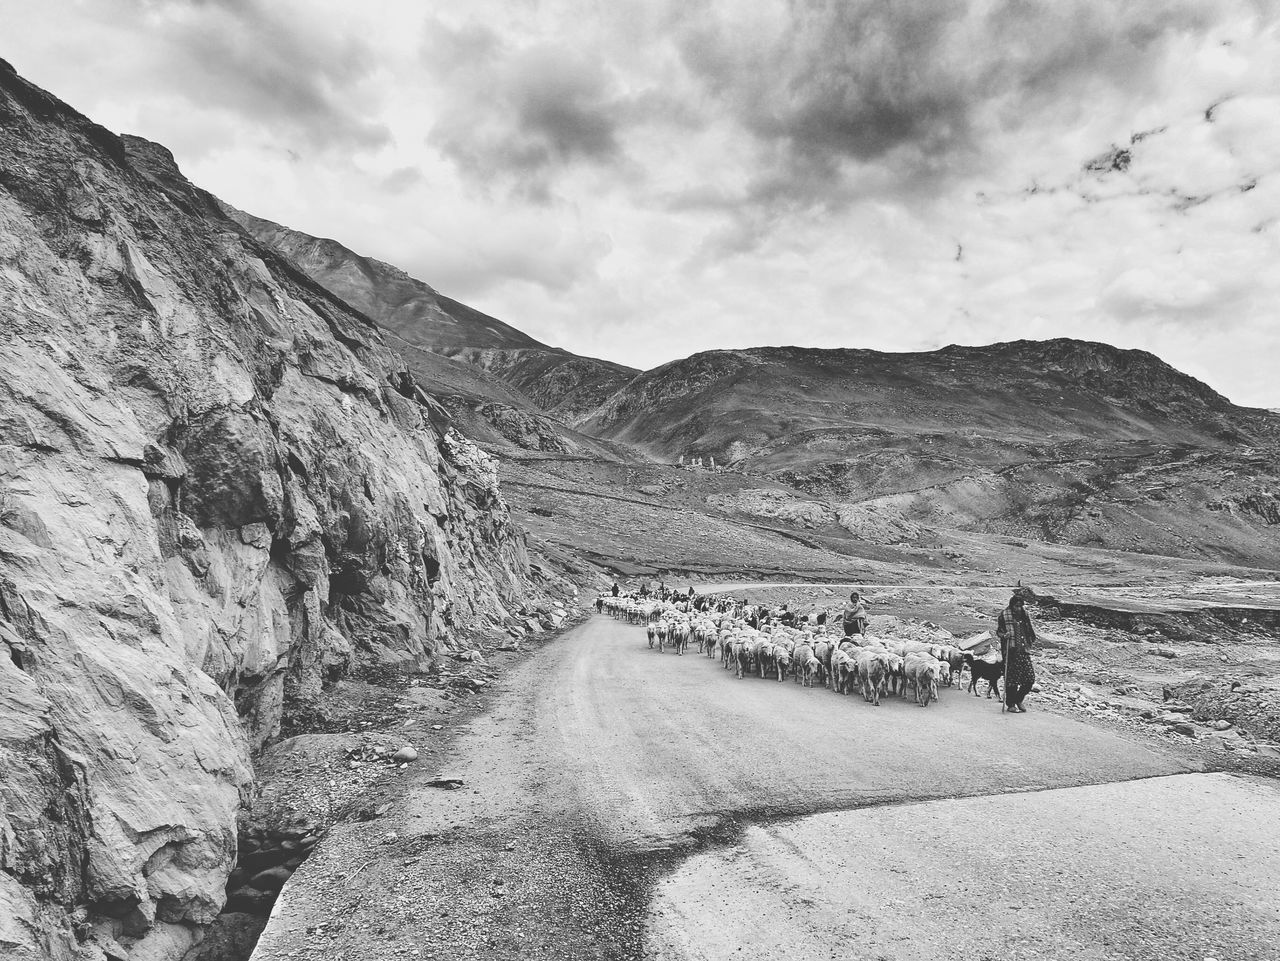 Shepard Shepards Of Ladakh Landscape Landscapes With WhiteWall Monochrome Sheep LehLadakh Leh Ladakh Remote Black & White EyeEm Indiaincredible India Black And White Collection